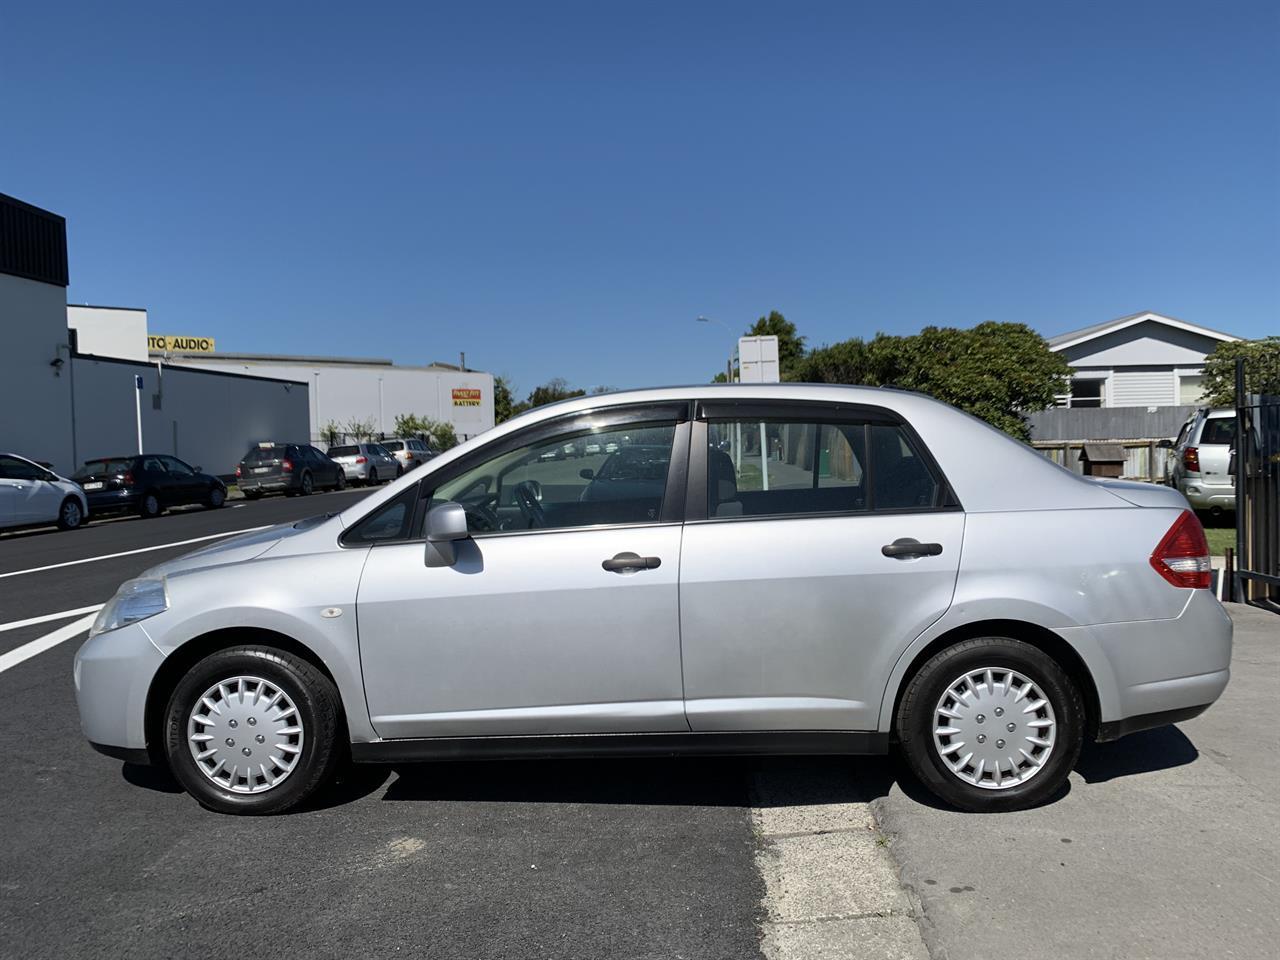 image-3, 2011 Nissan Tiida LATIO SILVER SALOON at Christchurch